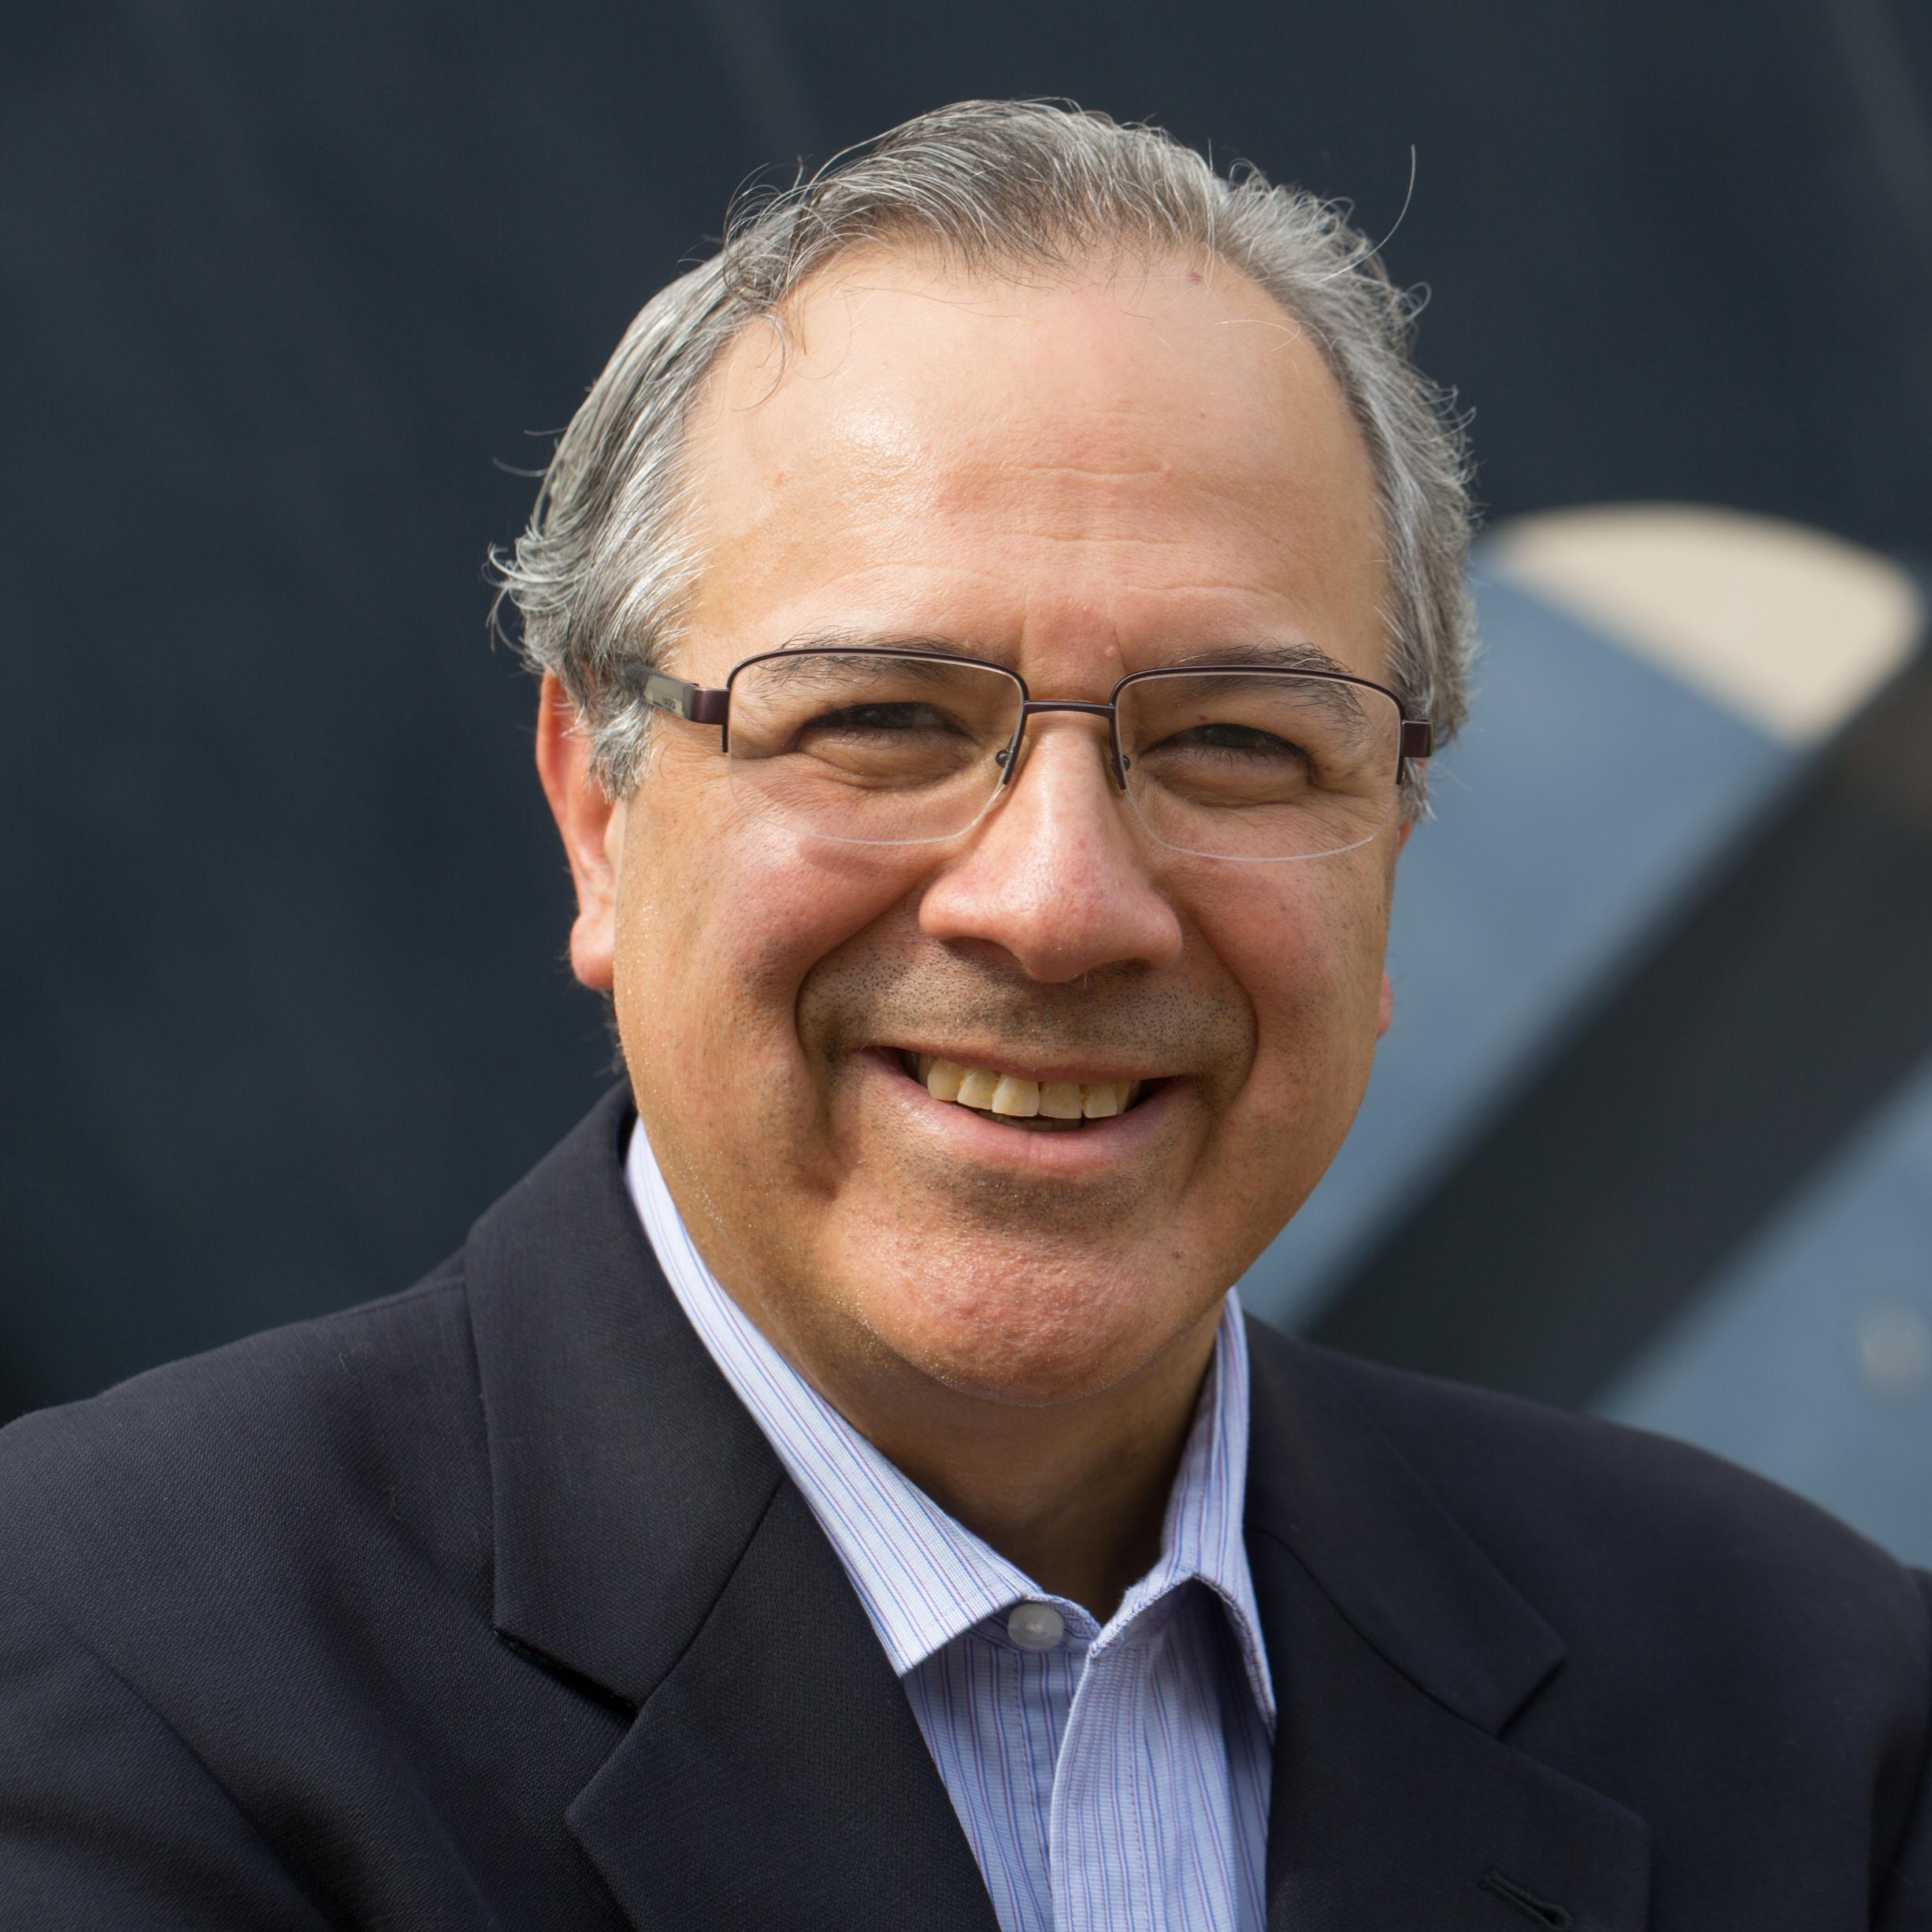 Louis Caldera